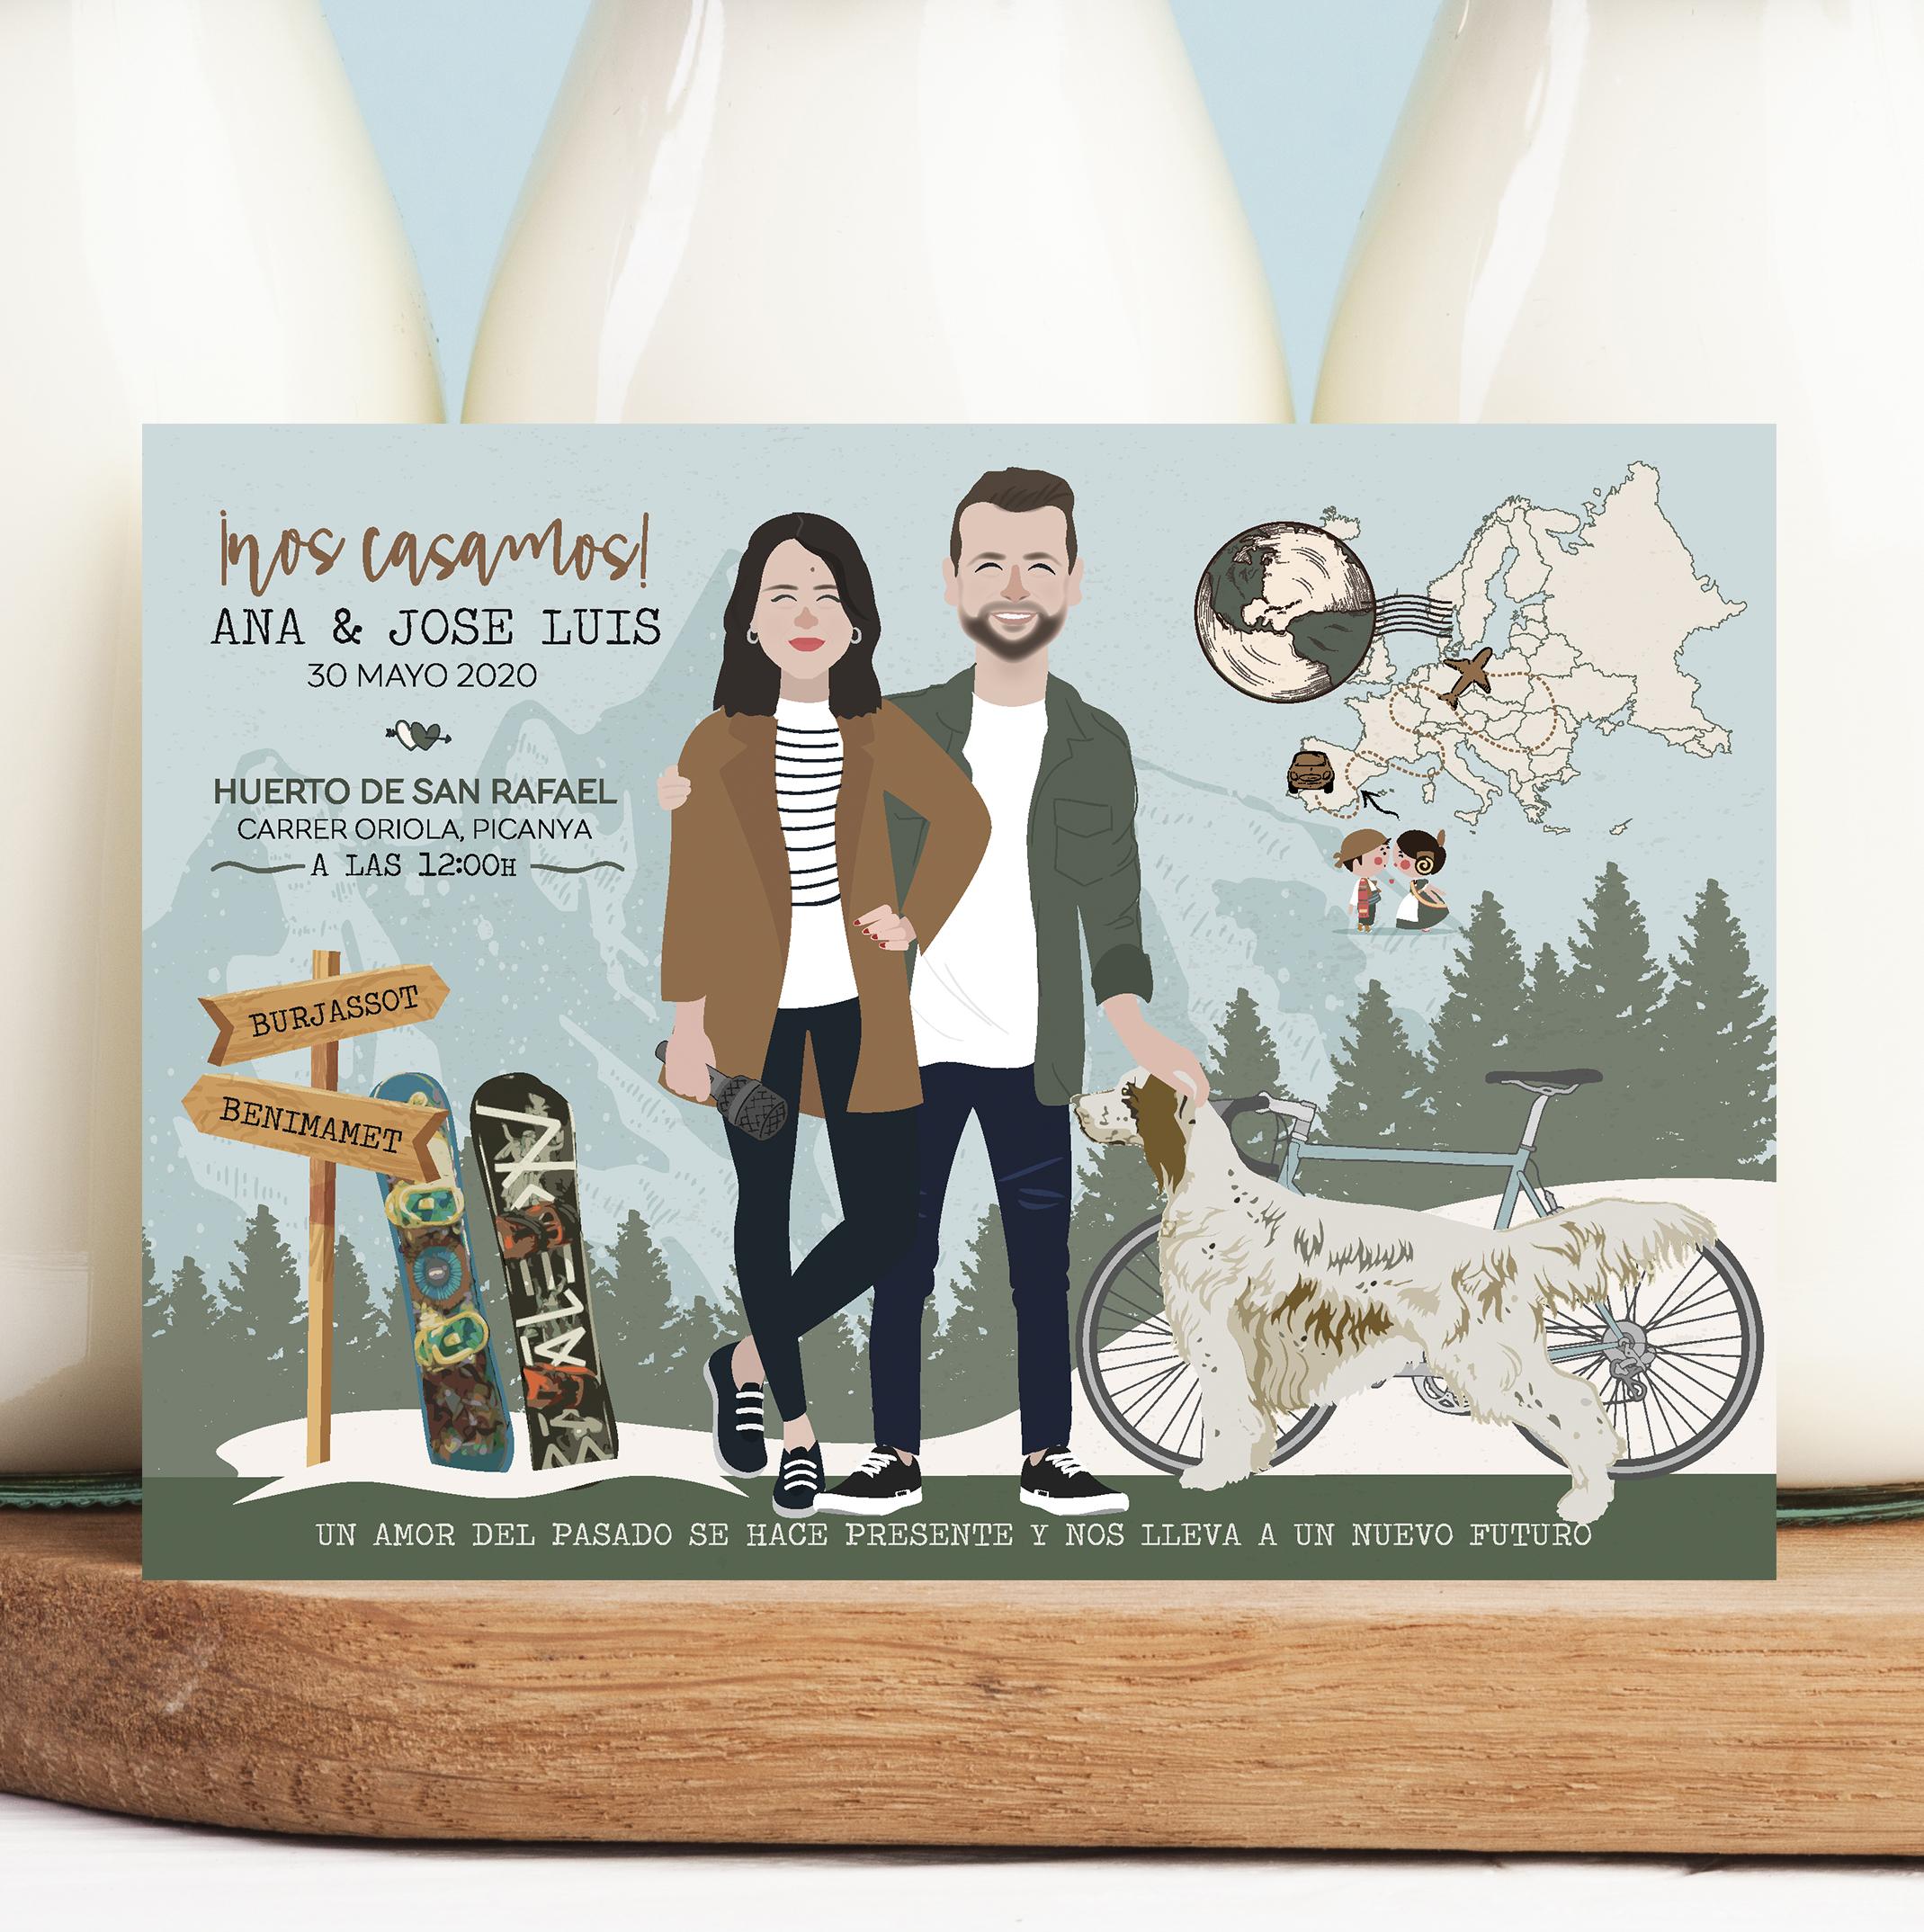 ilustracion-personalizada-invitacionboda-pareja-valencia-asturias-mdebenito.jpg